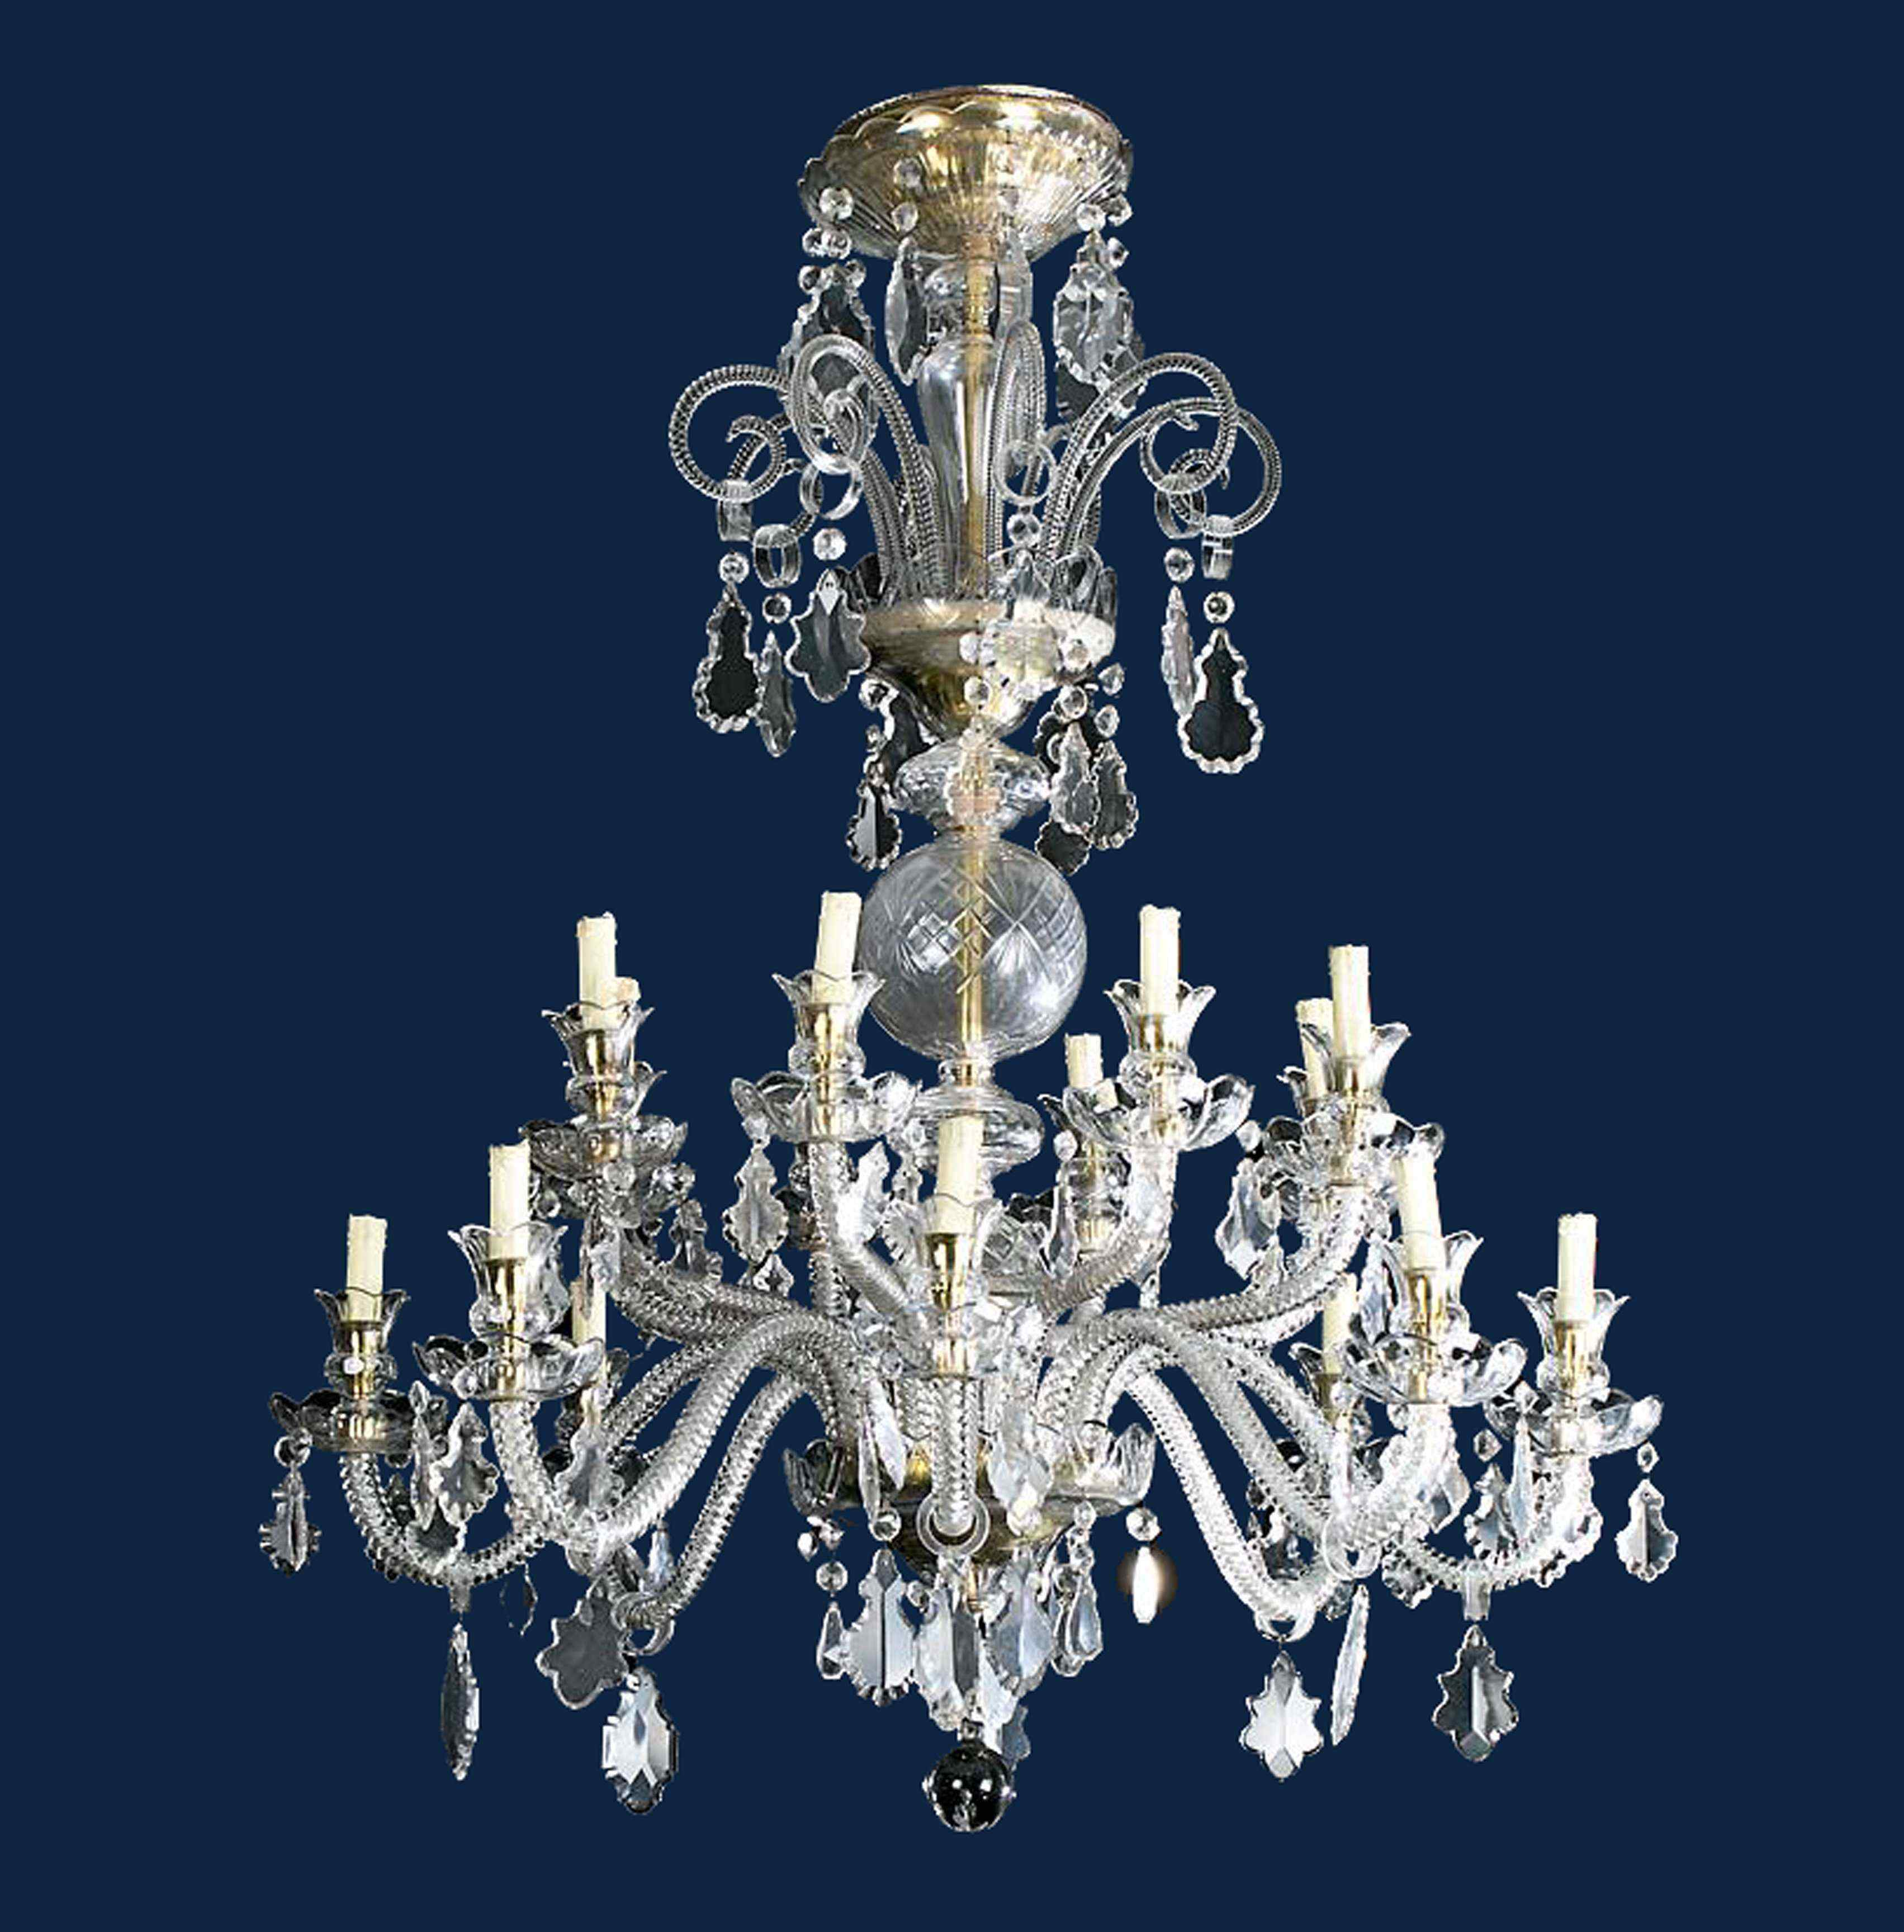 Chandelier with 15 lights, XX century, glass, h cm 110